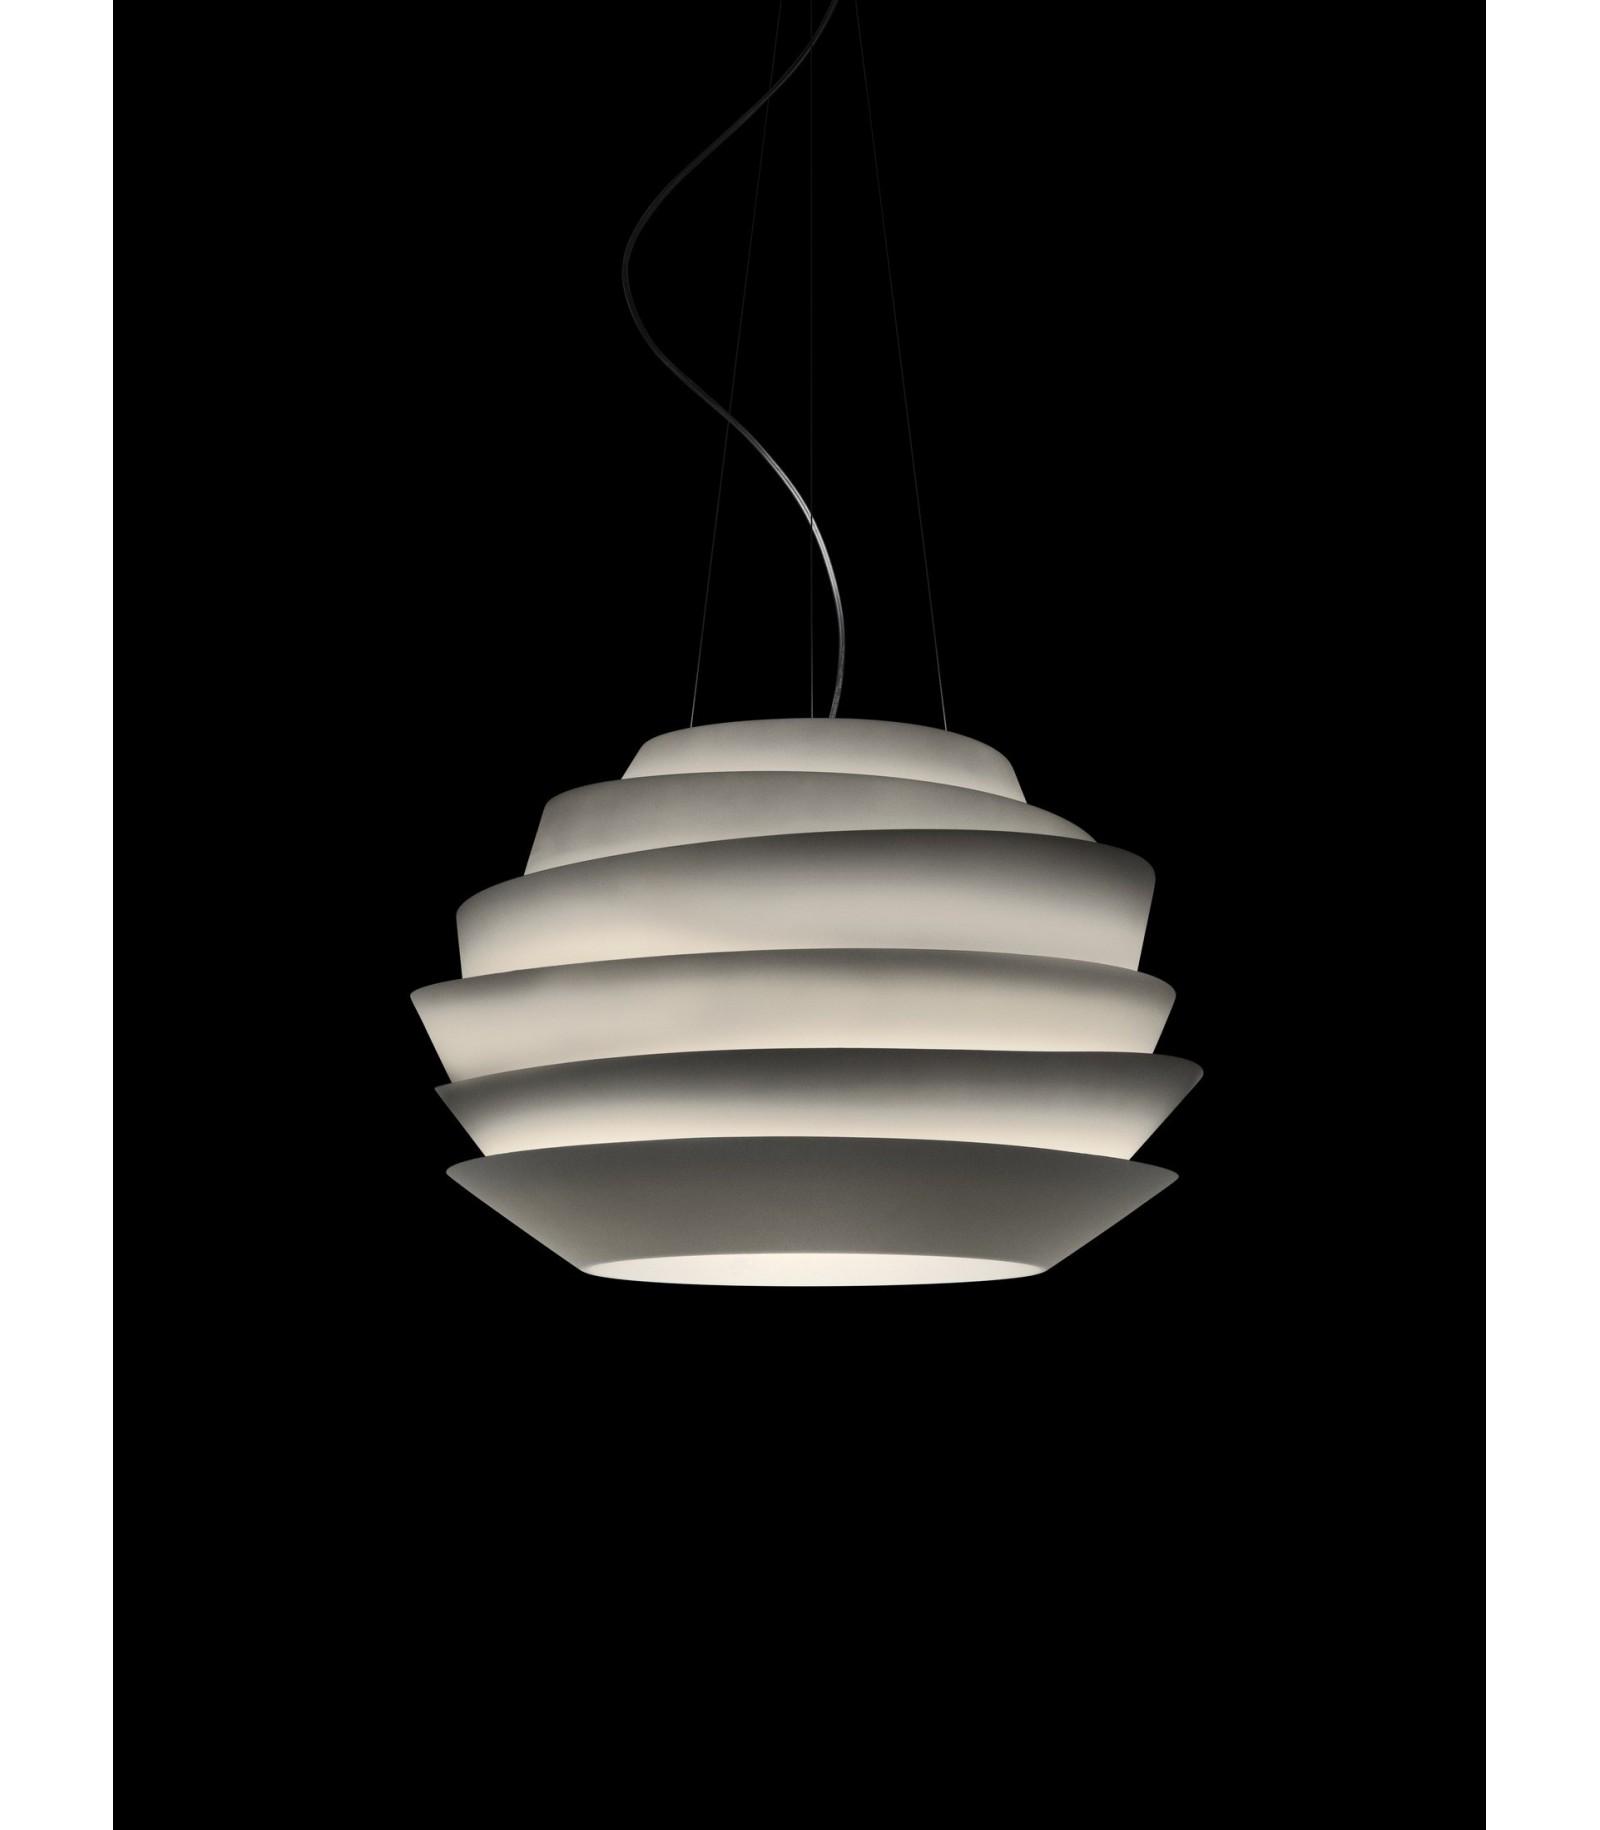 lampada foscarini le soleil sospensione. Black Bedroom Furniture Sets. Home Design Ideas